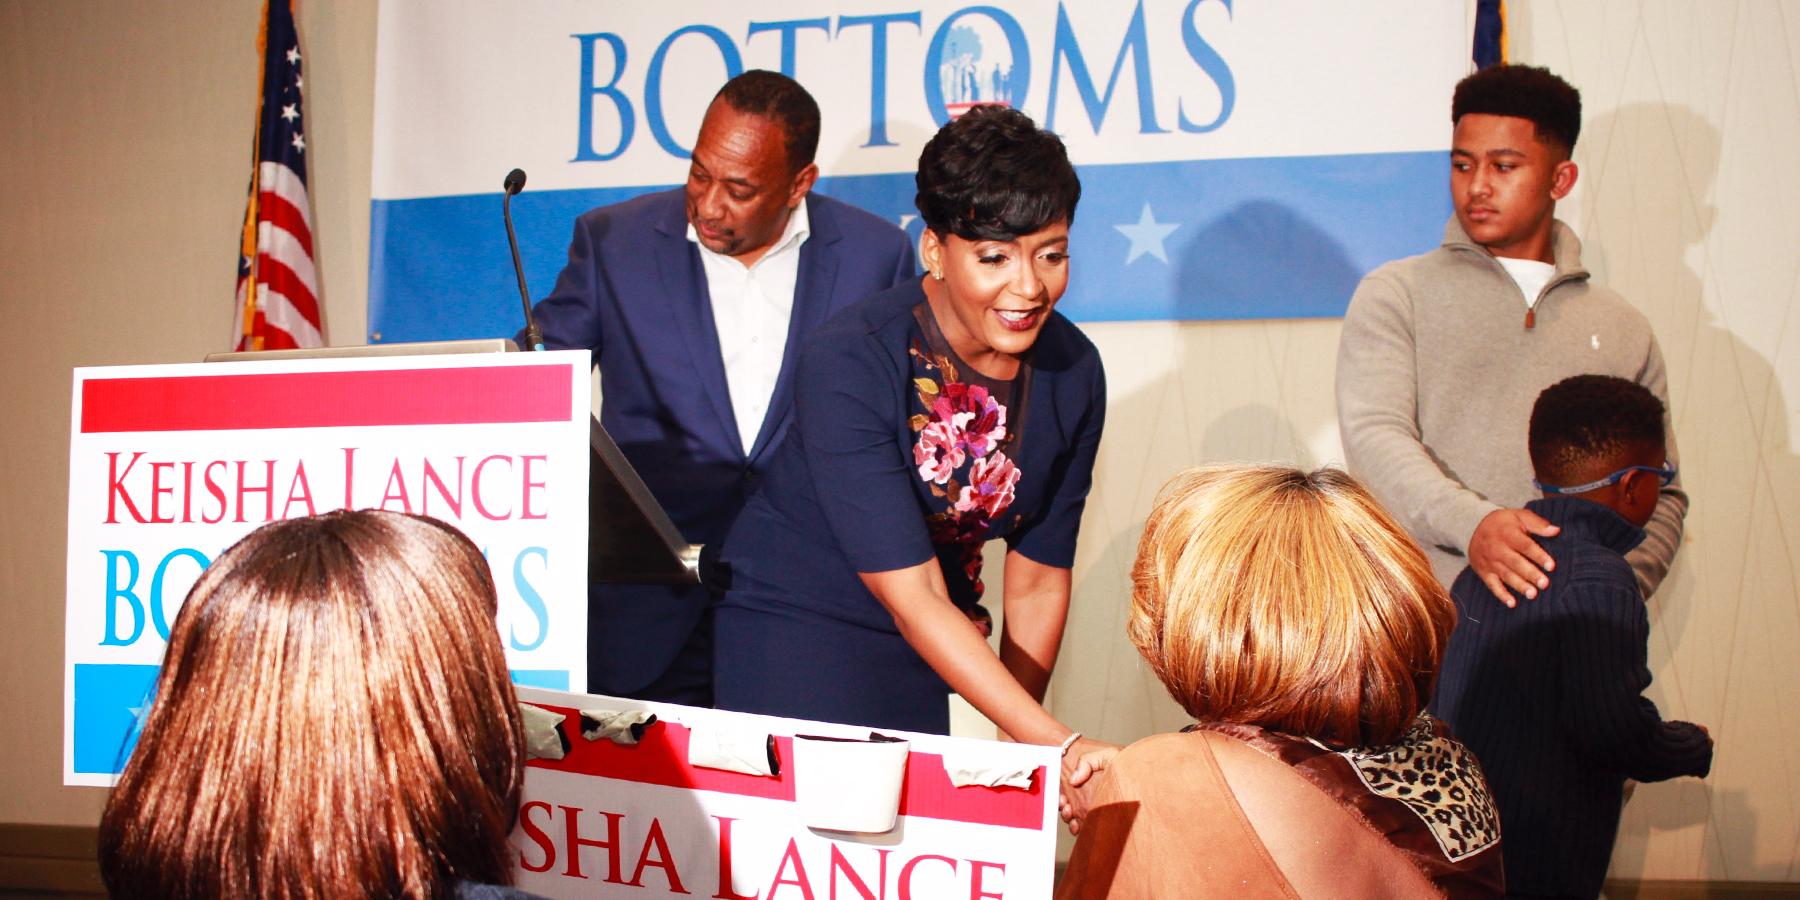 Atlanta's New Mayor Is A FAMU Graduate; Adding To An HBCU Tradition